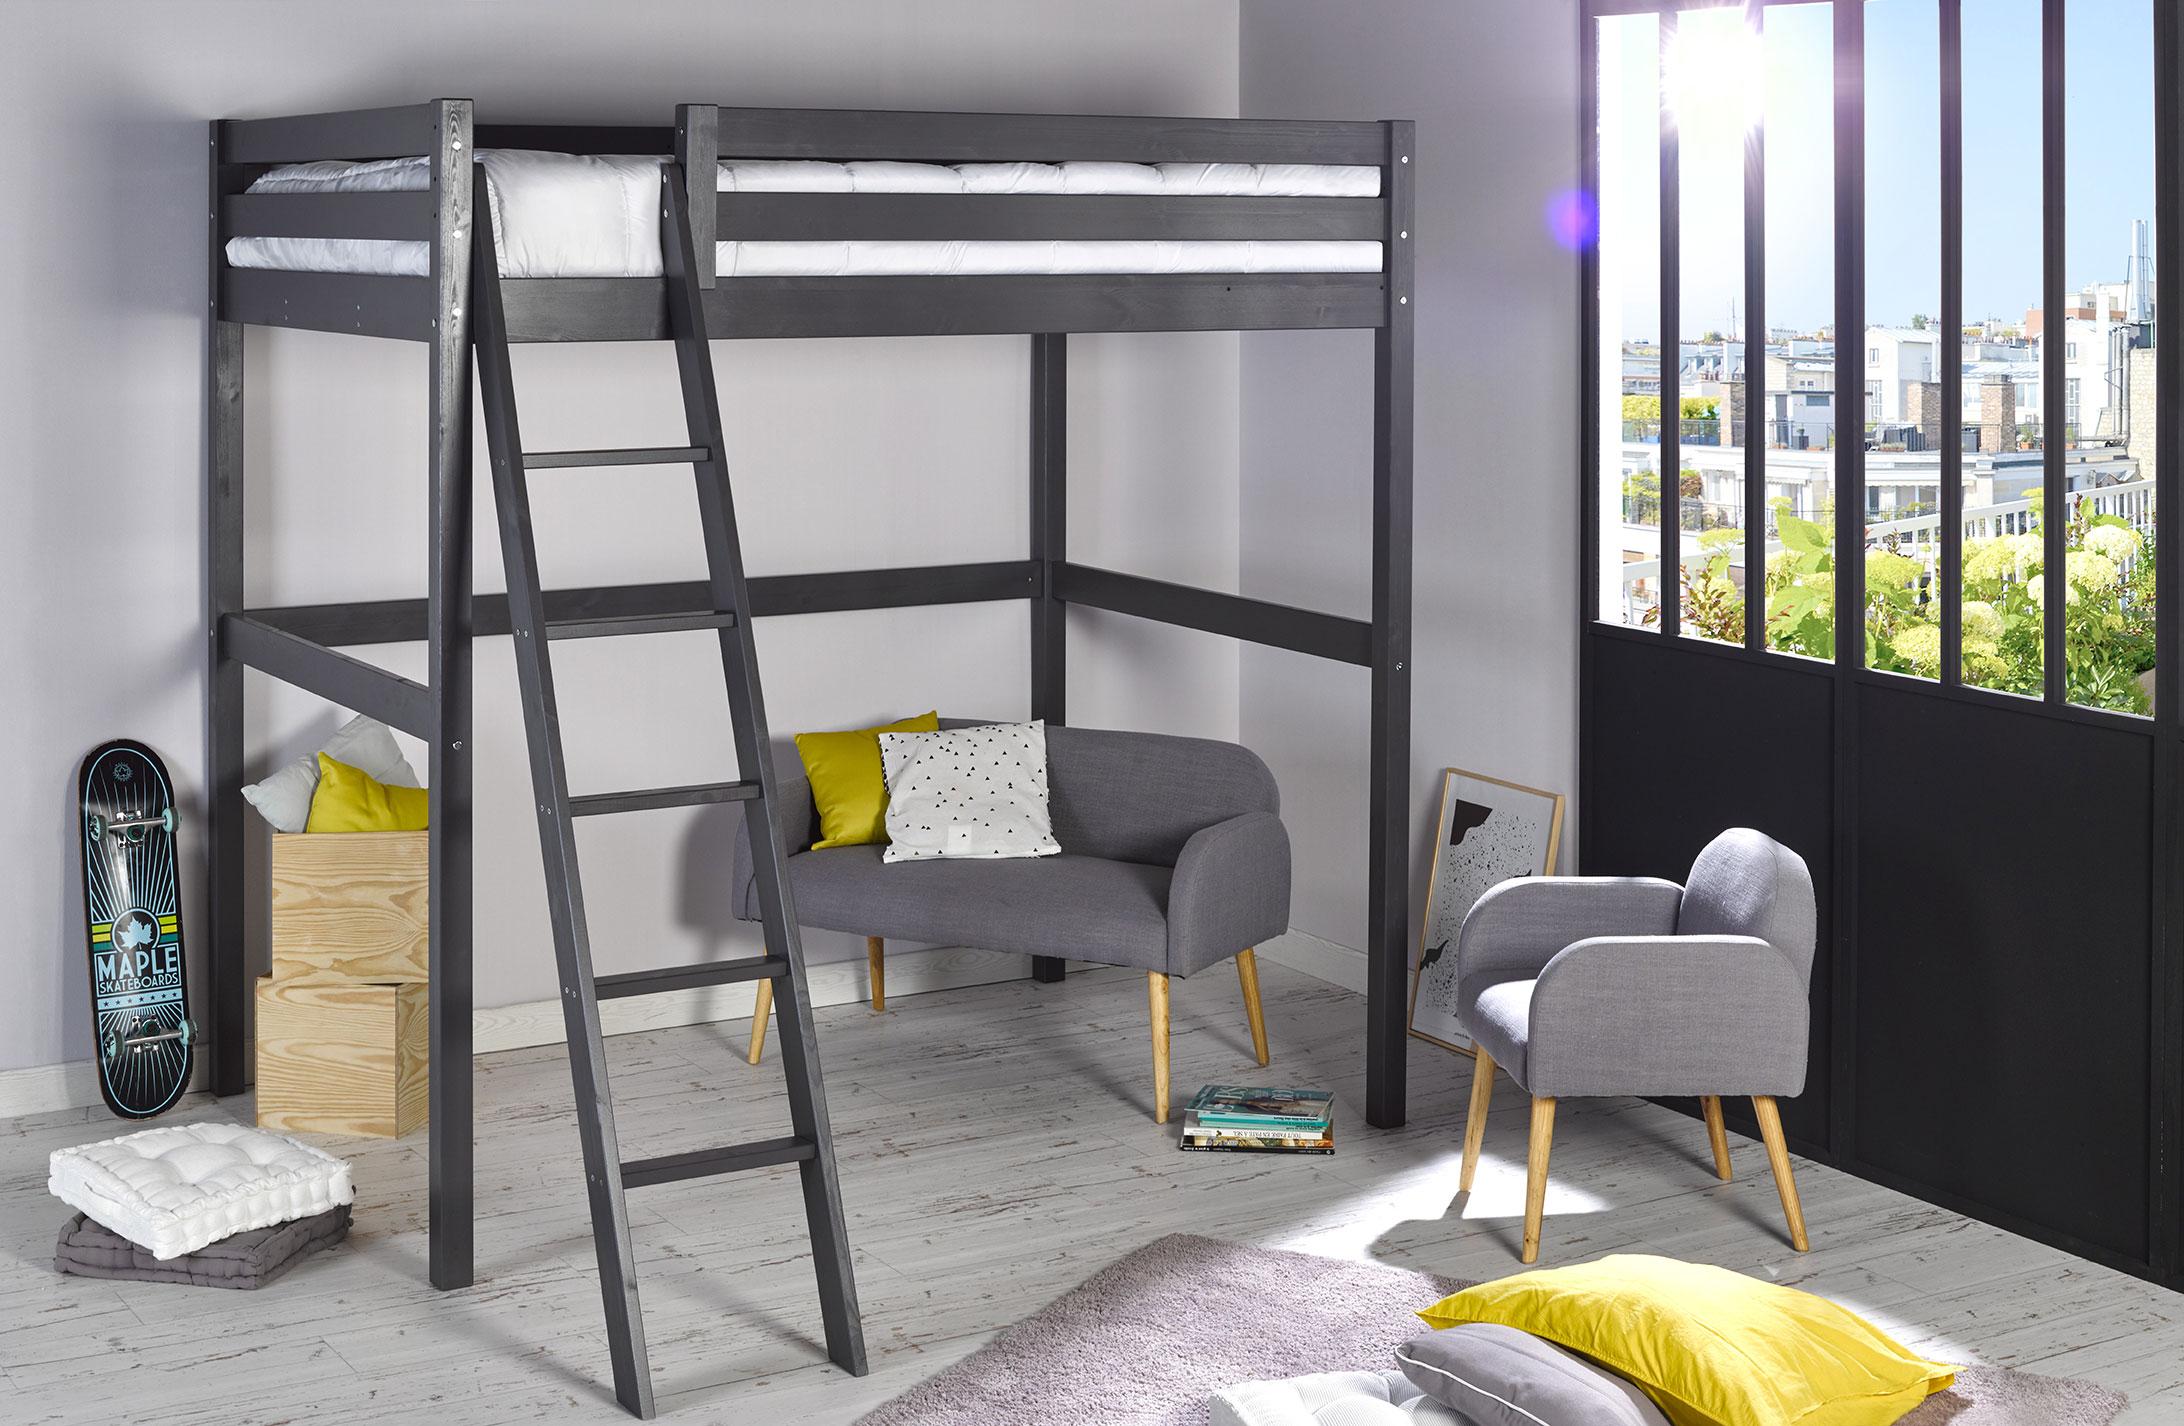 lit mezzanine 140 wood gris anthracite idkid 39 s. Black Bedroom Furniture Sets. Home Design Ideas